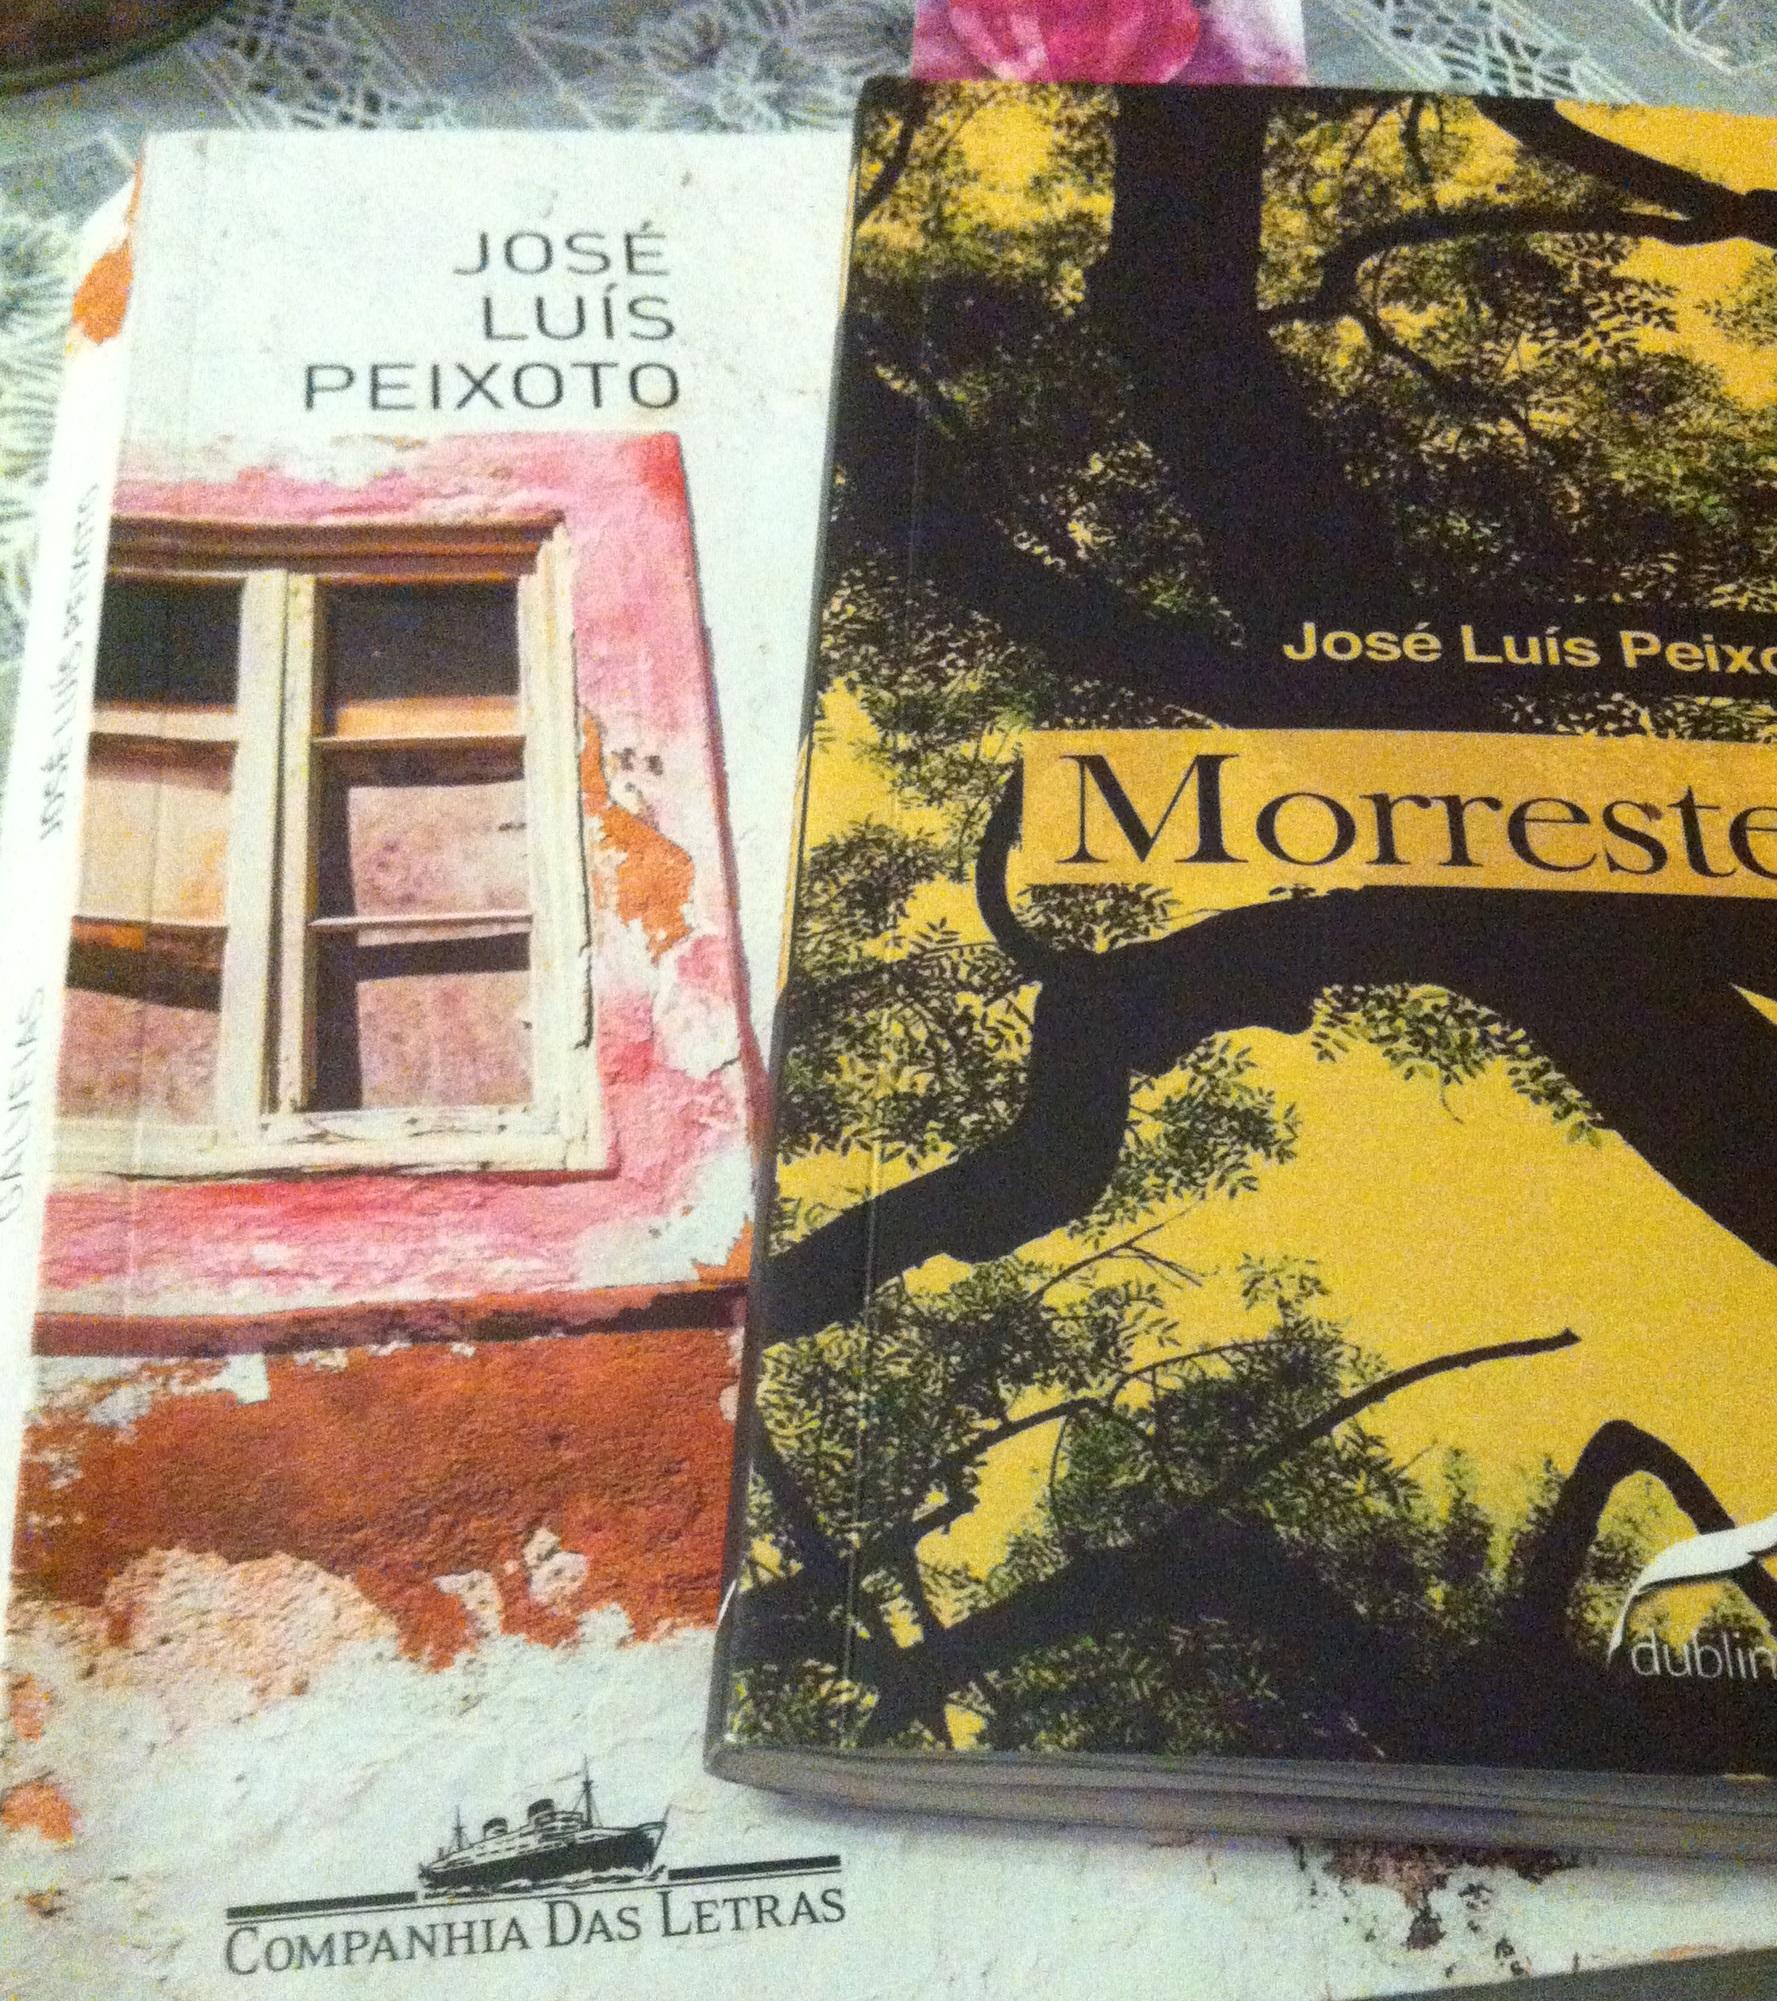 Dois livros de José Luís Peixoto